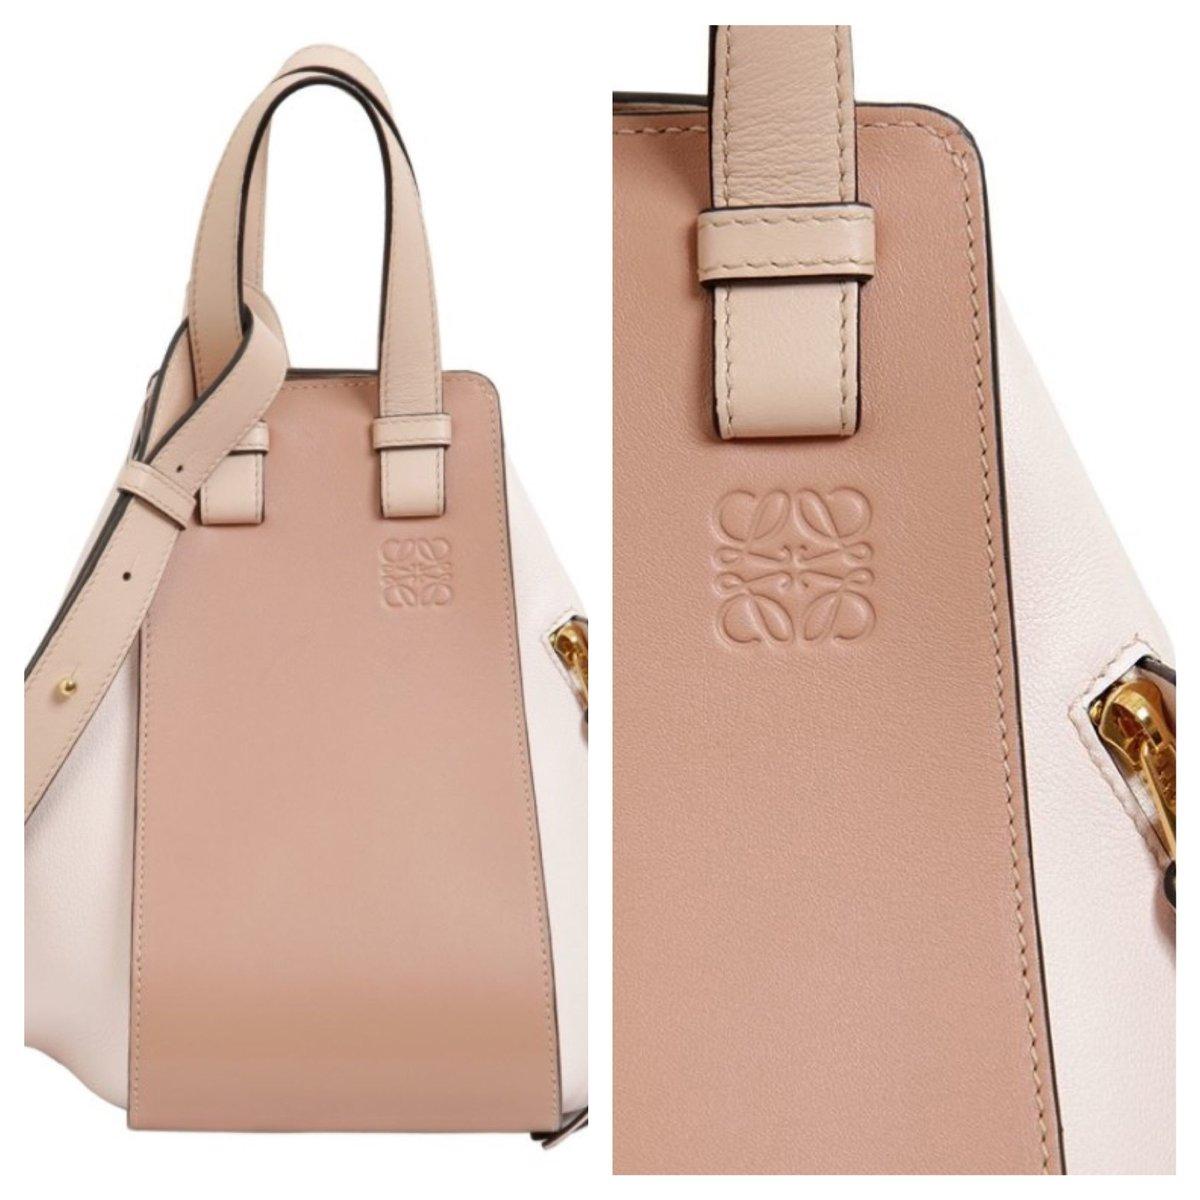 #skylarlondon #personalshopper SMALL HAMMOCK MULTICOLOR @LuisaViaRoma #freelancemodel #bag #sac #designer #instastyle<br>http://pic.twitter.com/8cOSJCVWUx